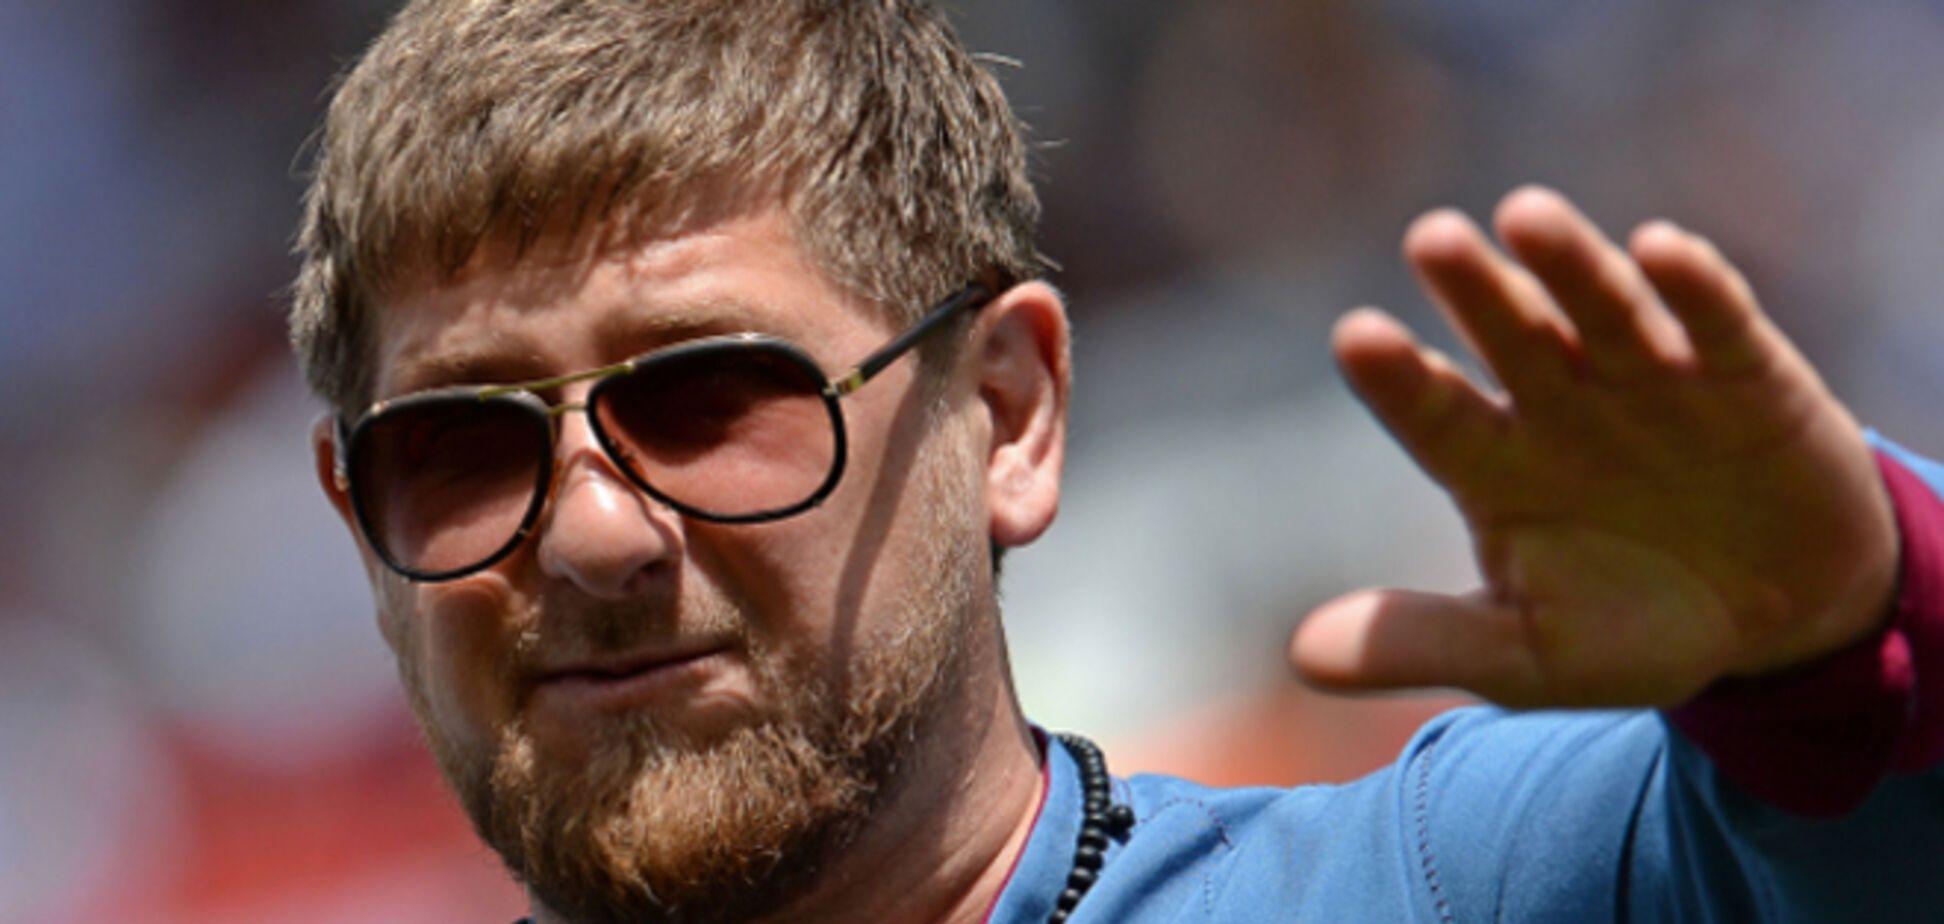 Кадиров назвав Україну 'командою КВН ФСБ'